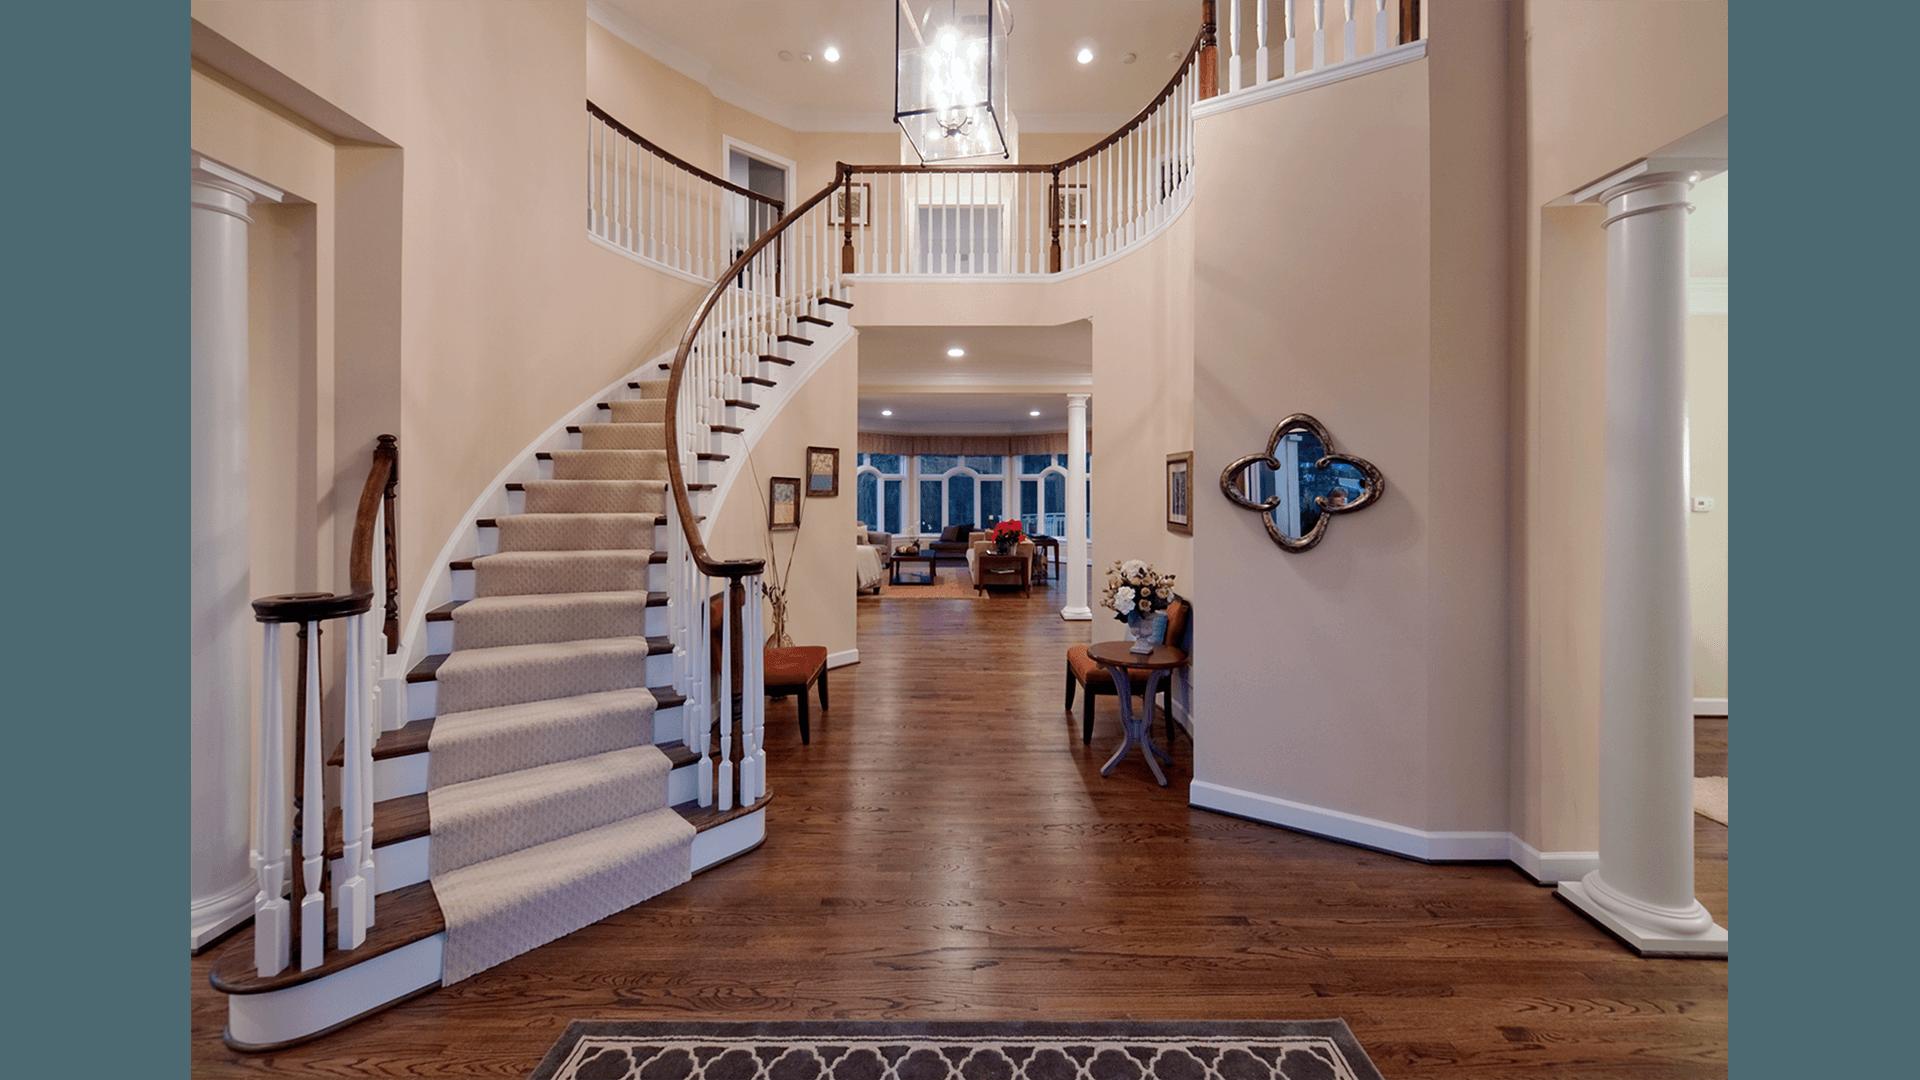 Grovemont Winthrop - Foyer